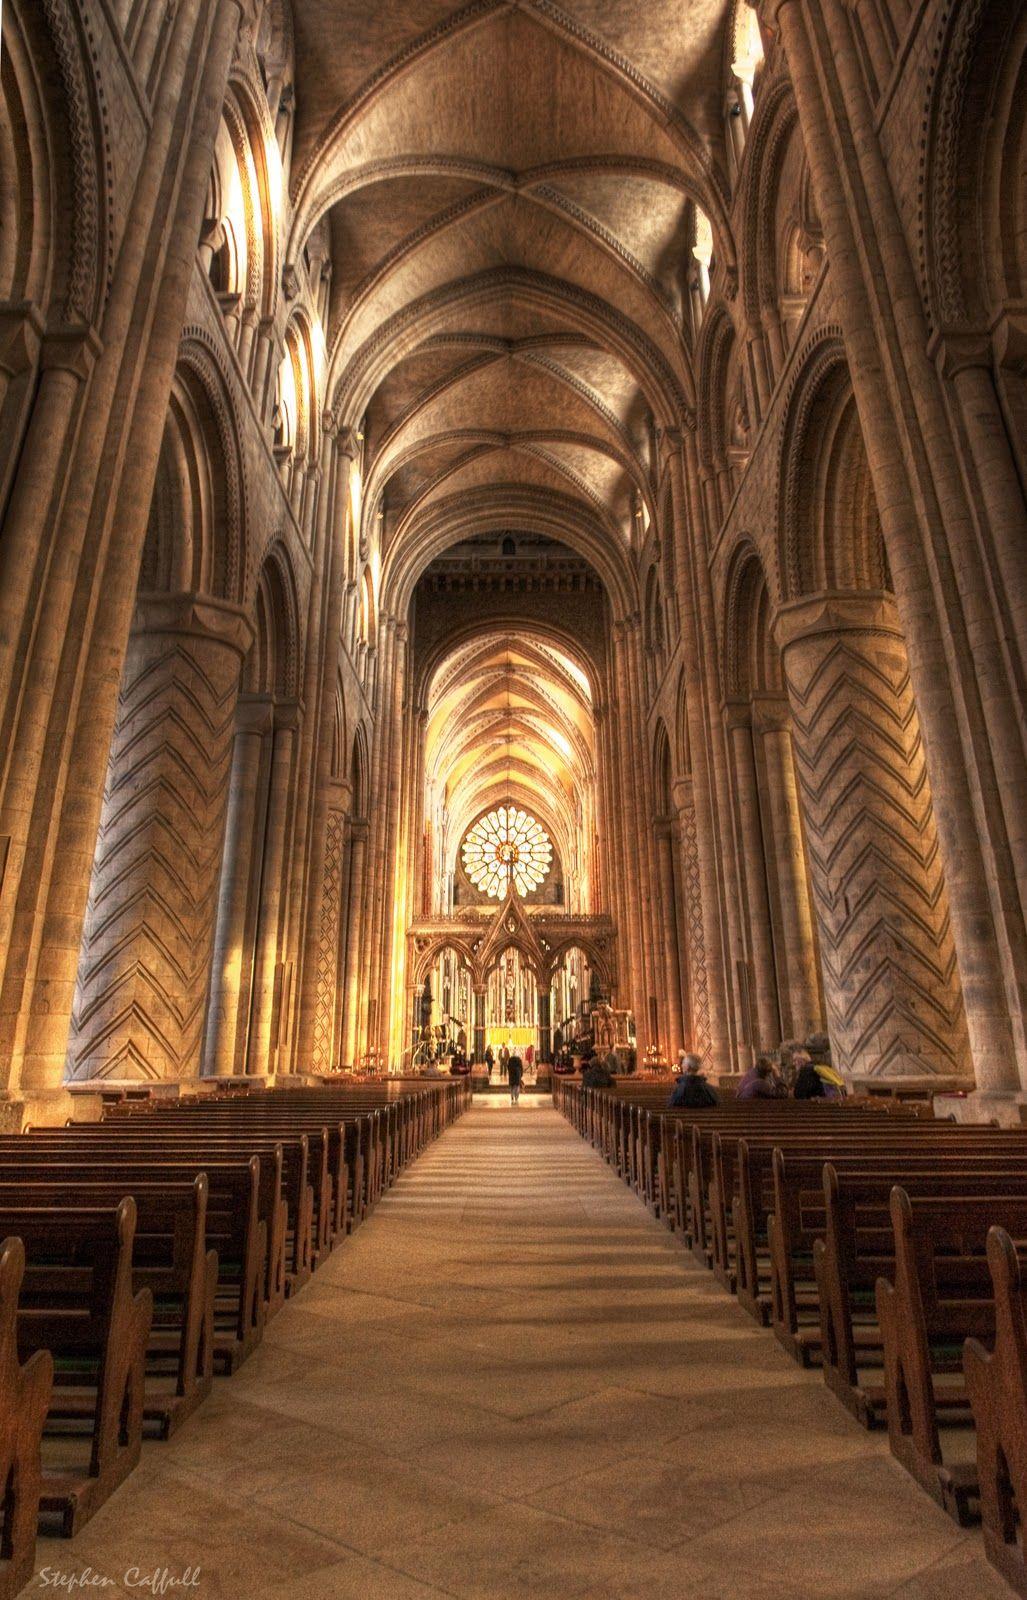 Interior de la catedral de durham en inglaterra london and uk trip 2019 pinterest durham - Catedral de sevilla interior ...